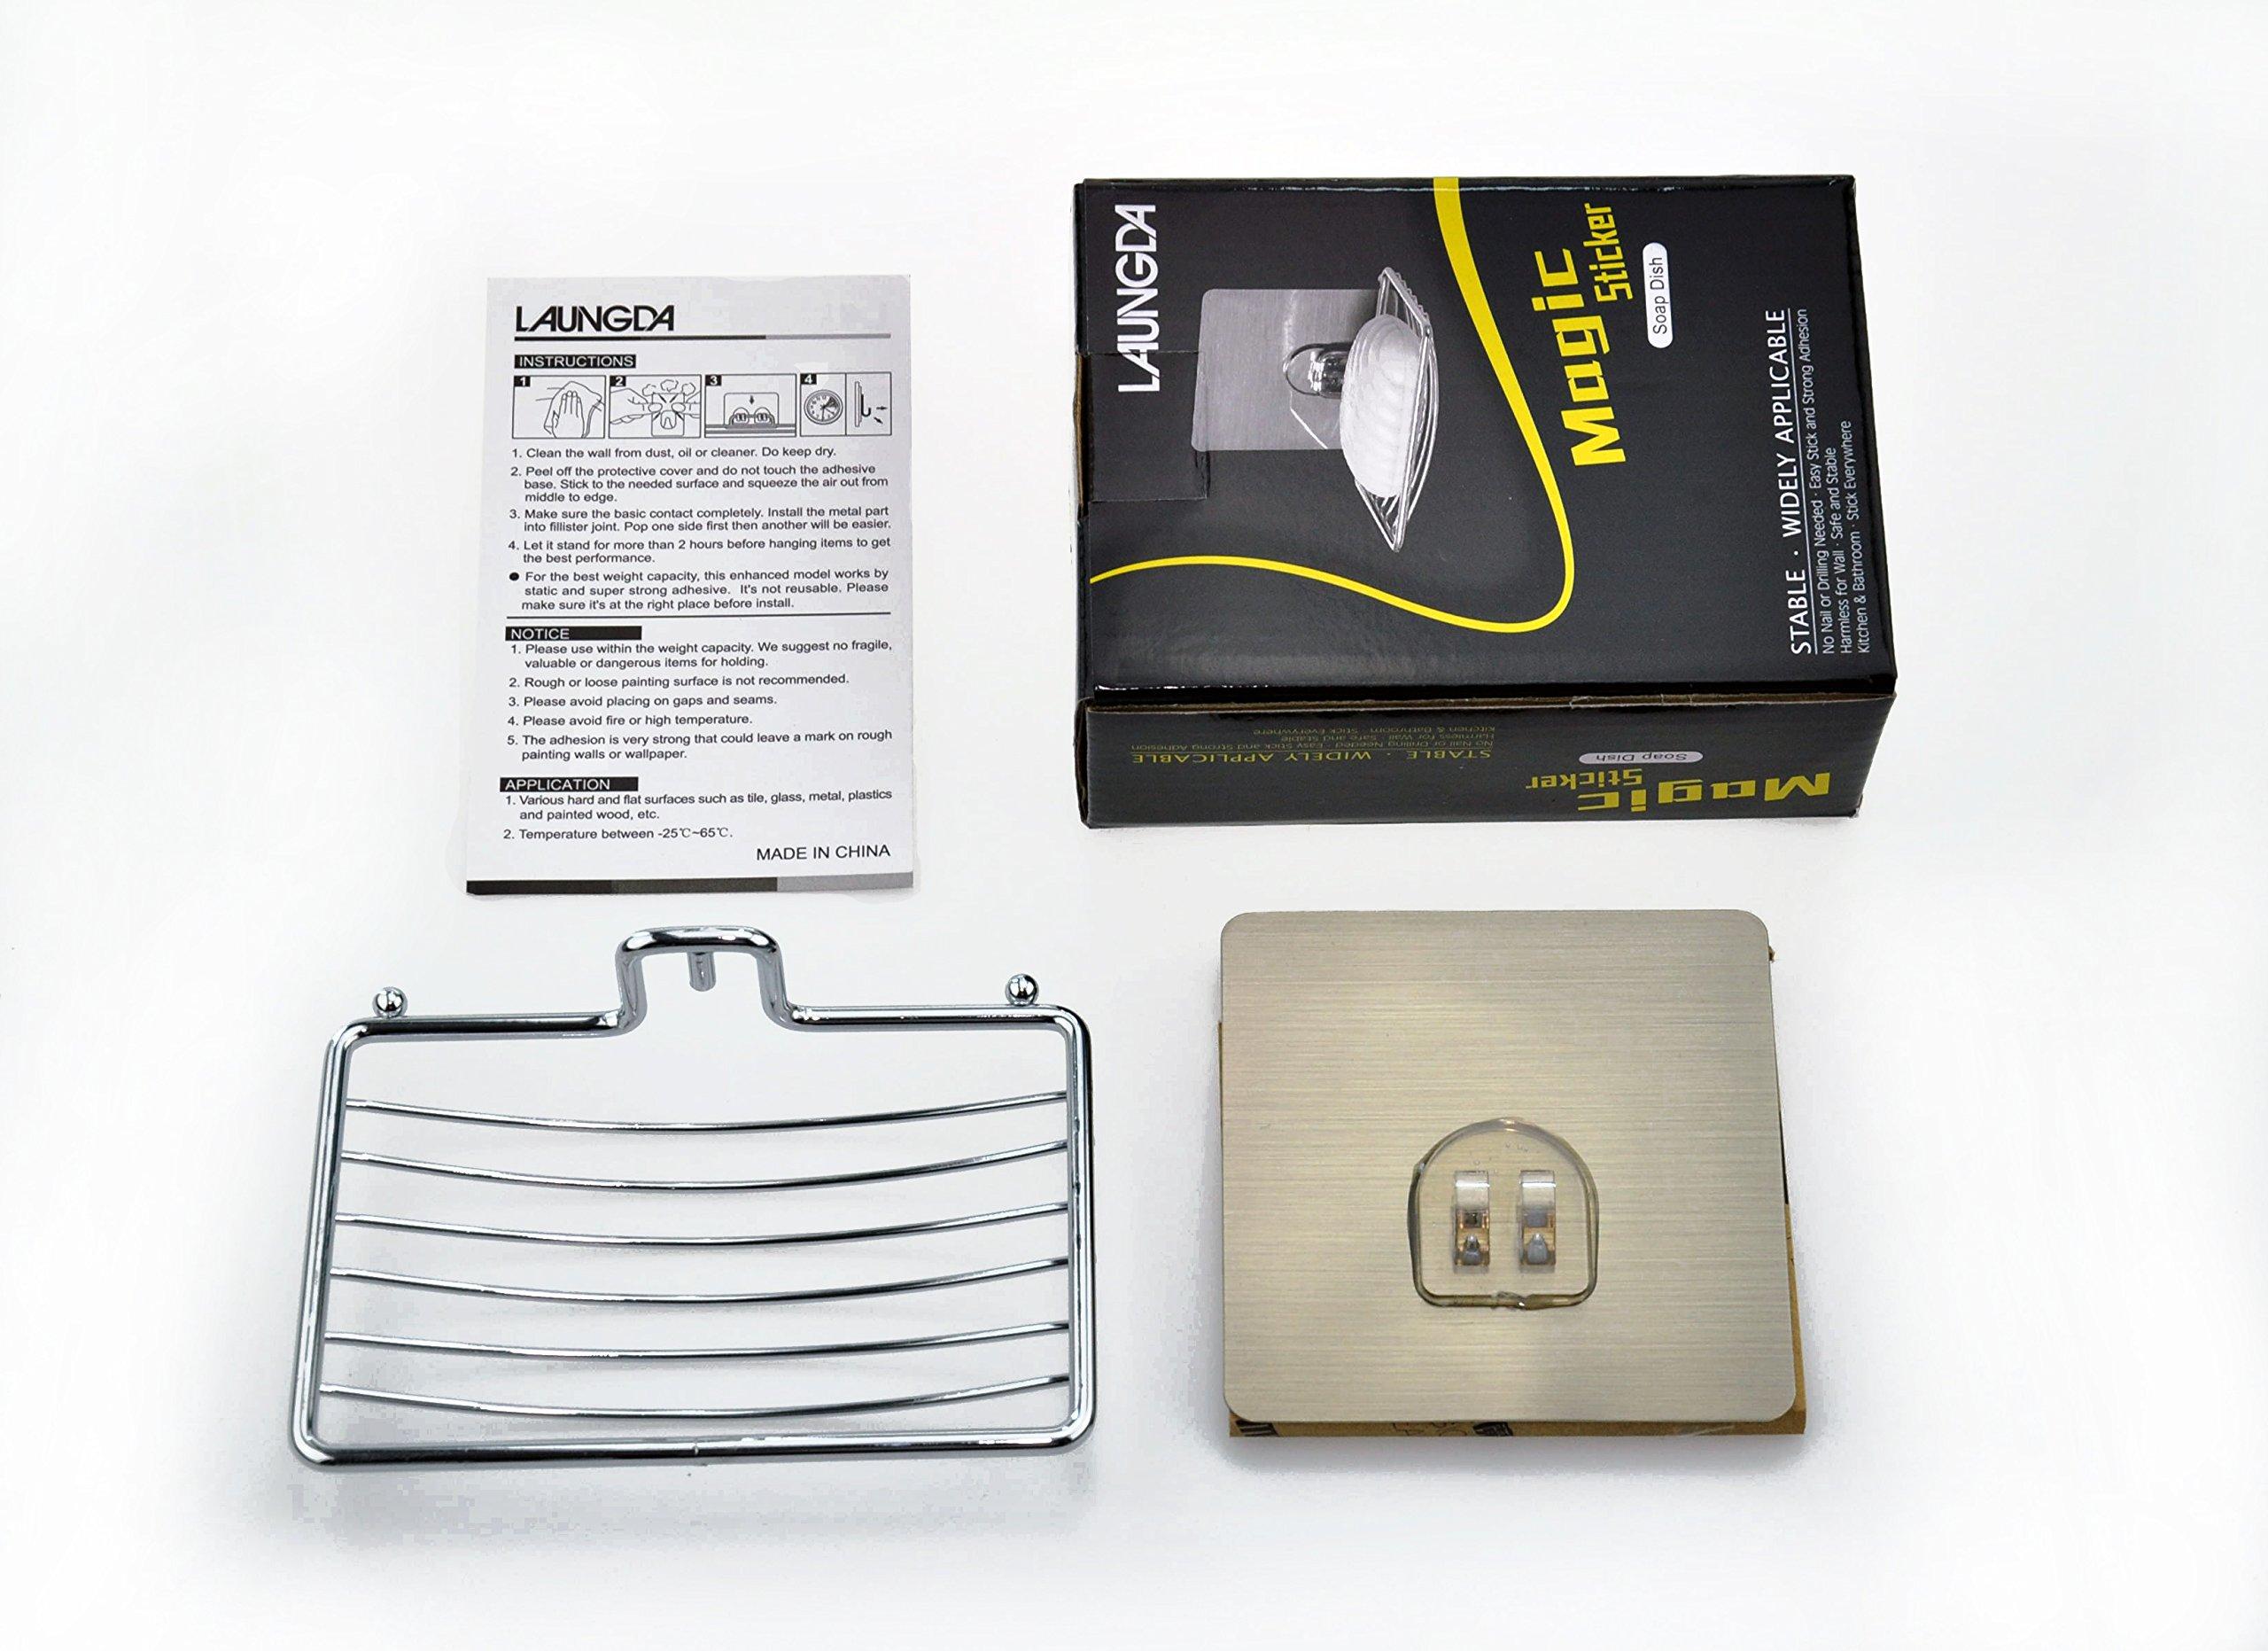 Laungda Soap Dish Adhesive Soap Holder Chrome Soap Dish Holder For